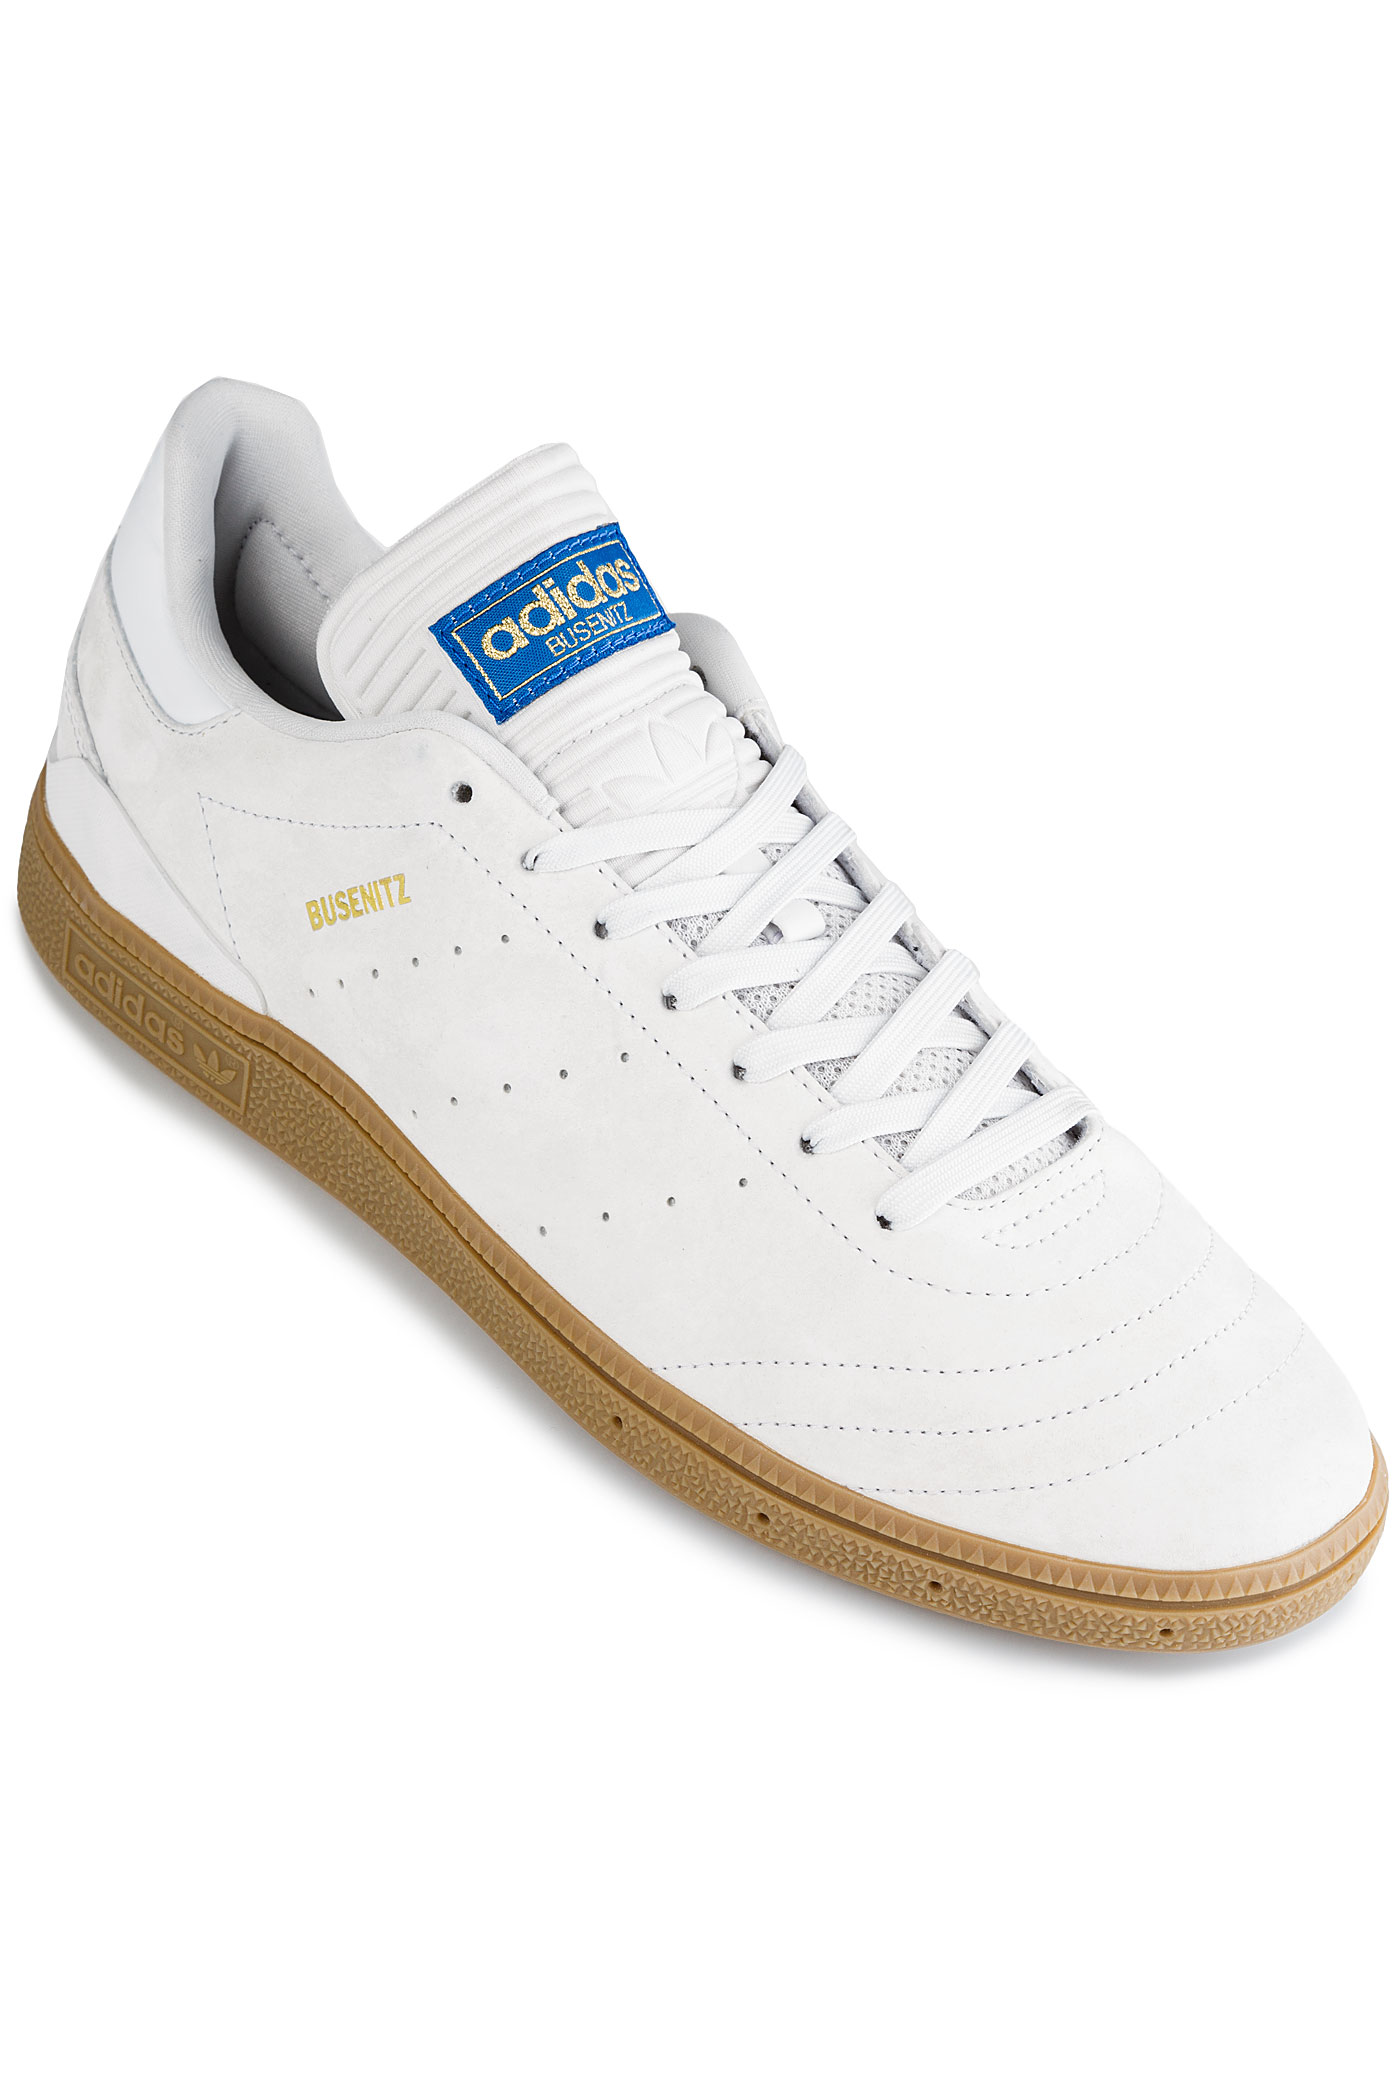 Skateboarding Rx Gum Gold Chaussurewhite Busenitz Adidas rWeQdxoCB